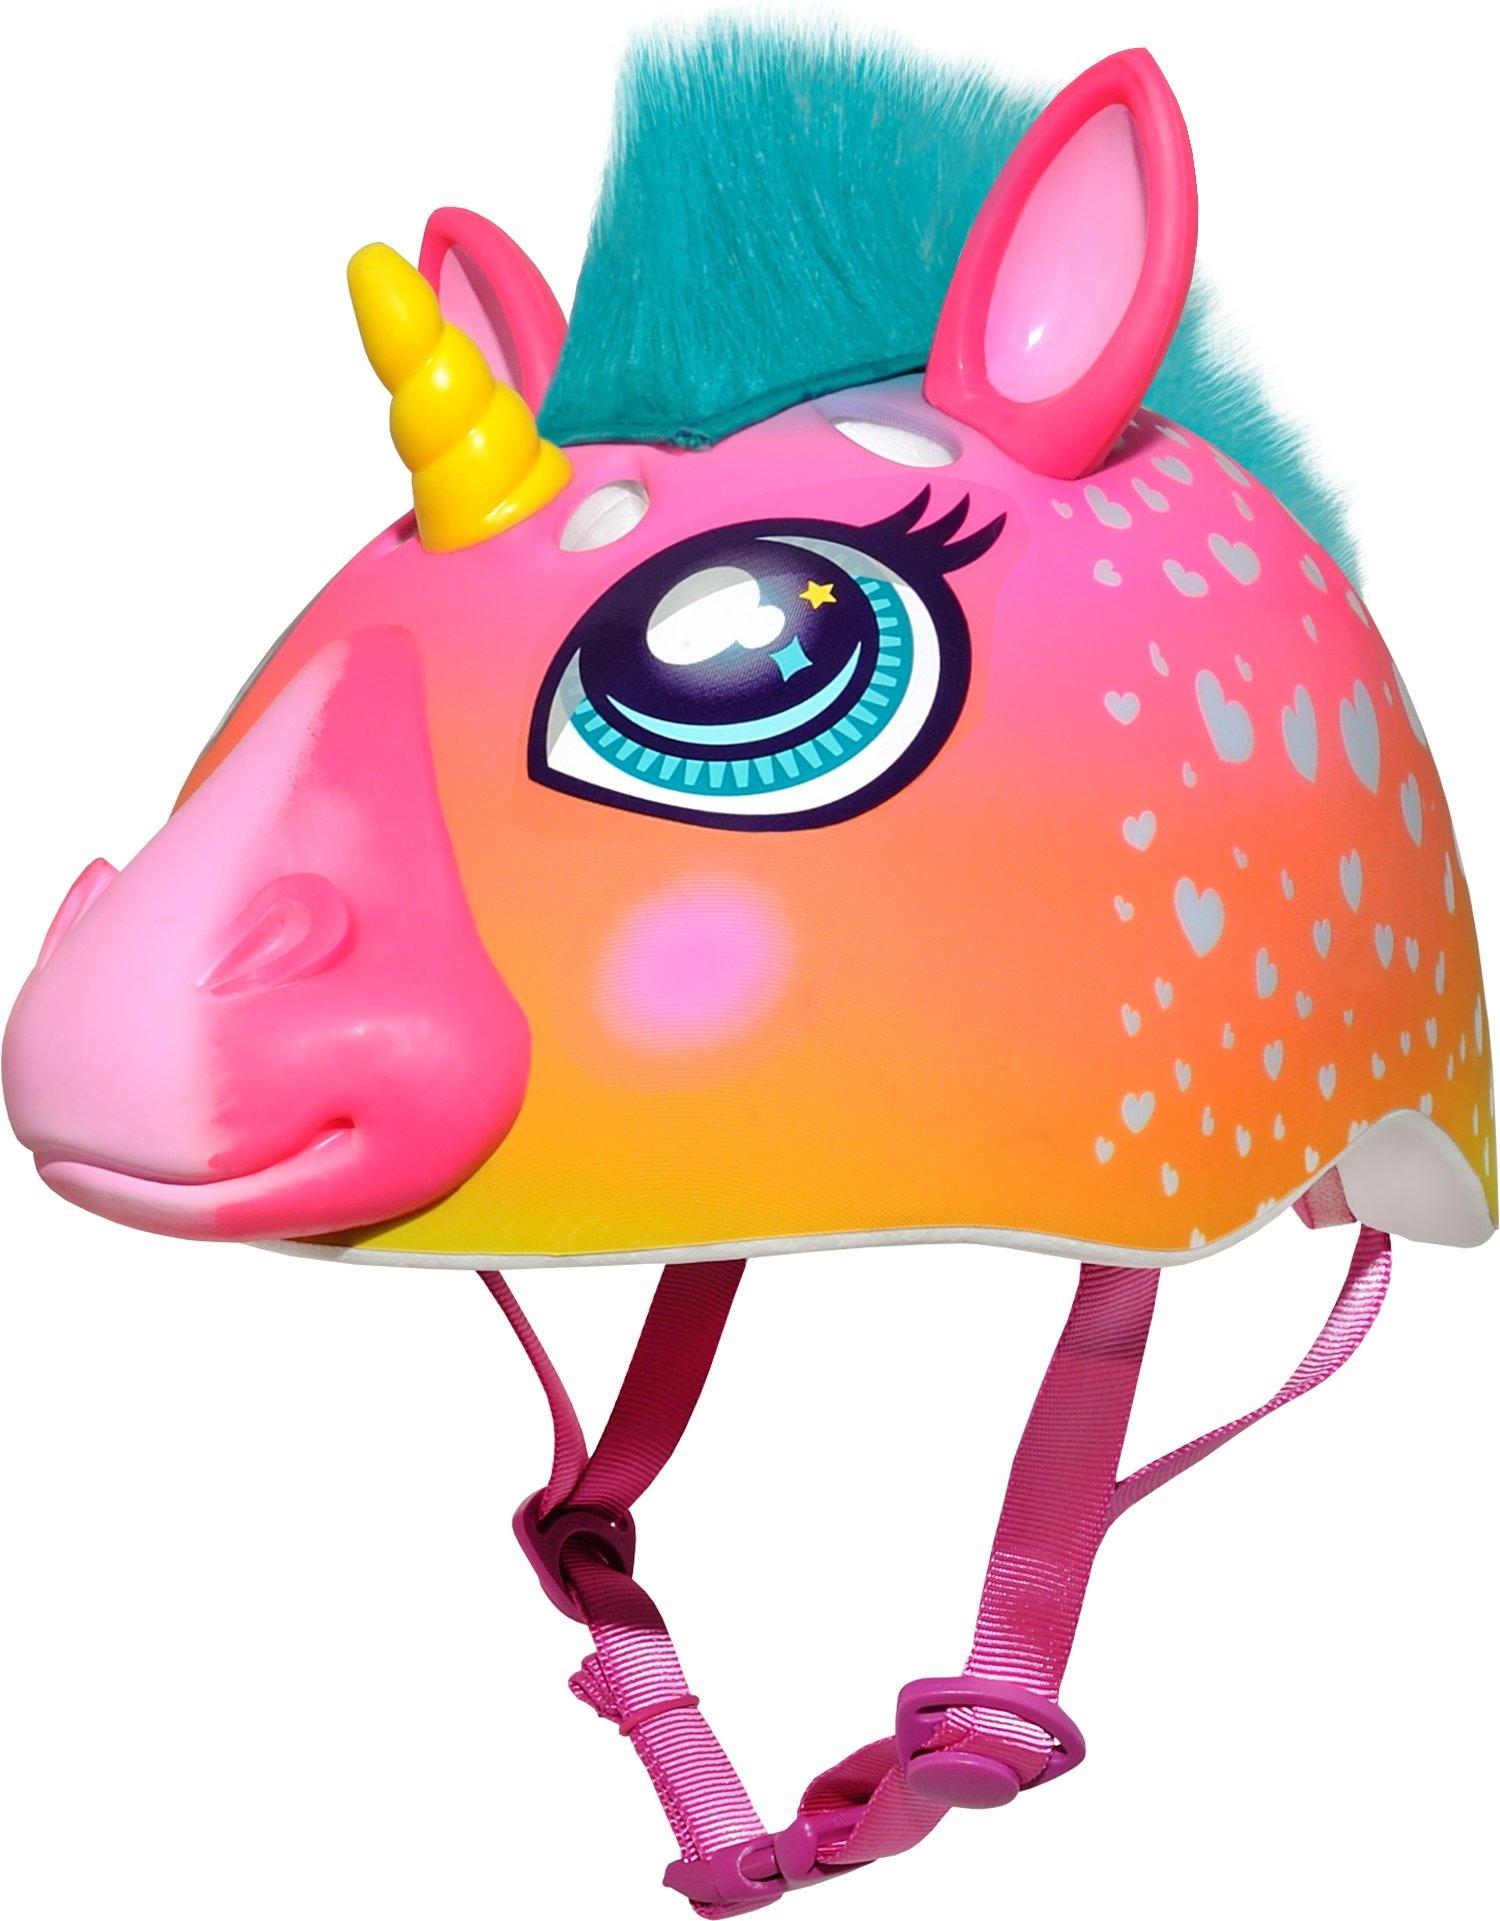 Raskullz Super Rainbow Corn Hair Helmet, Dark Pink